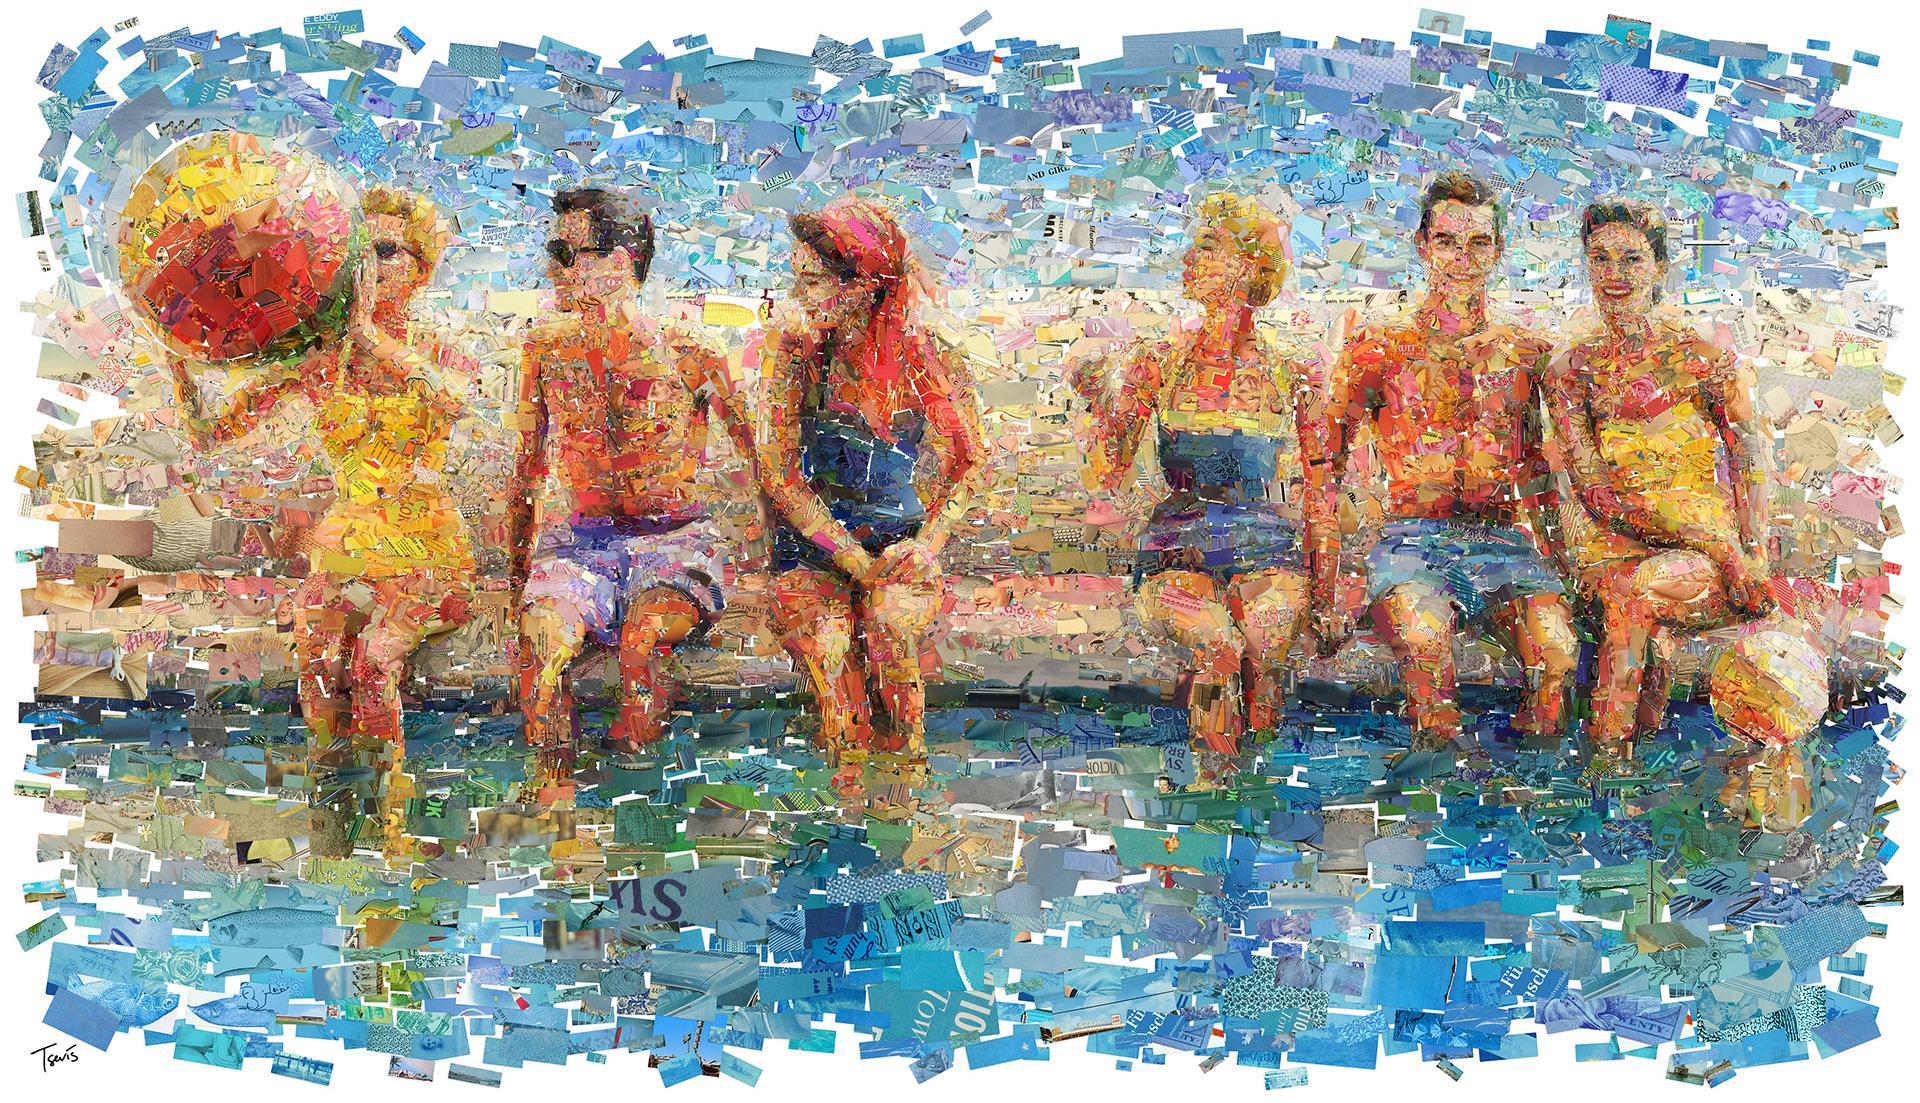 Бесконечное лето - Endless summer / Charis Tsevis